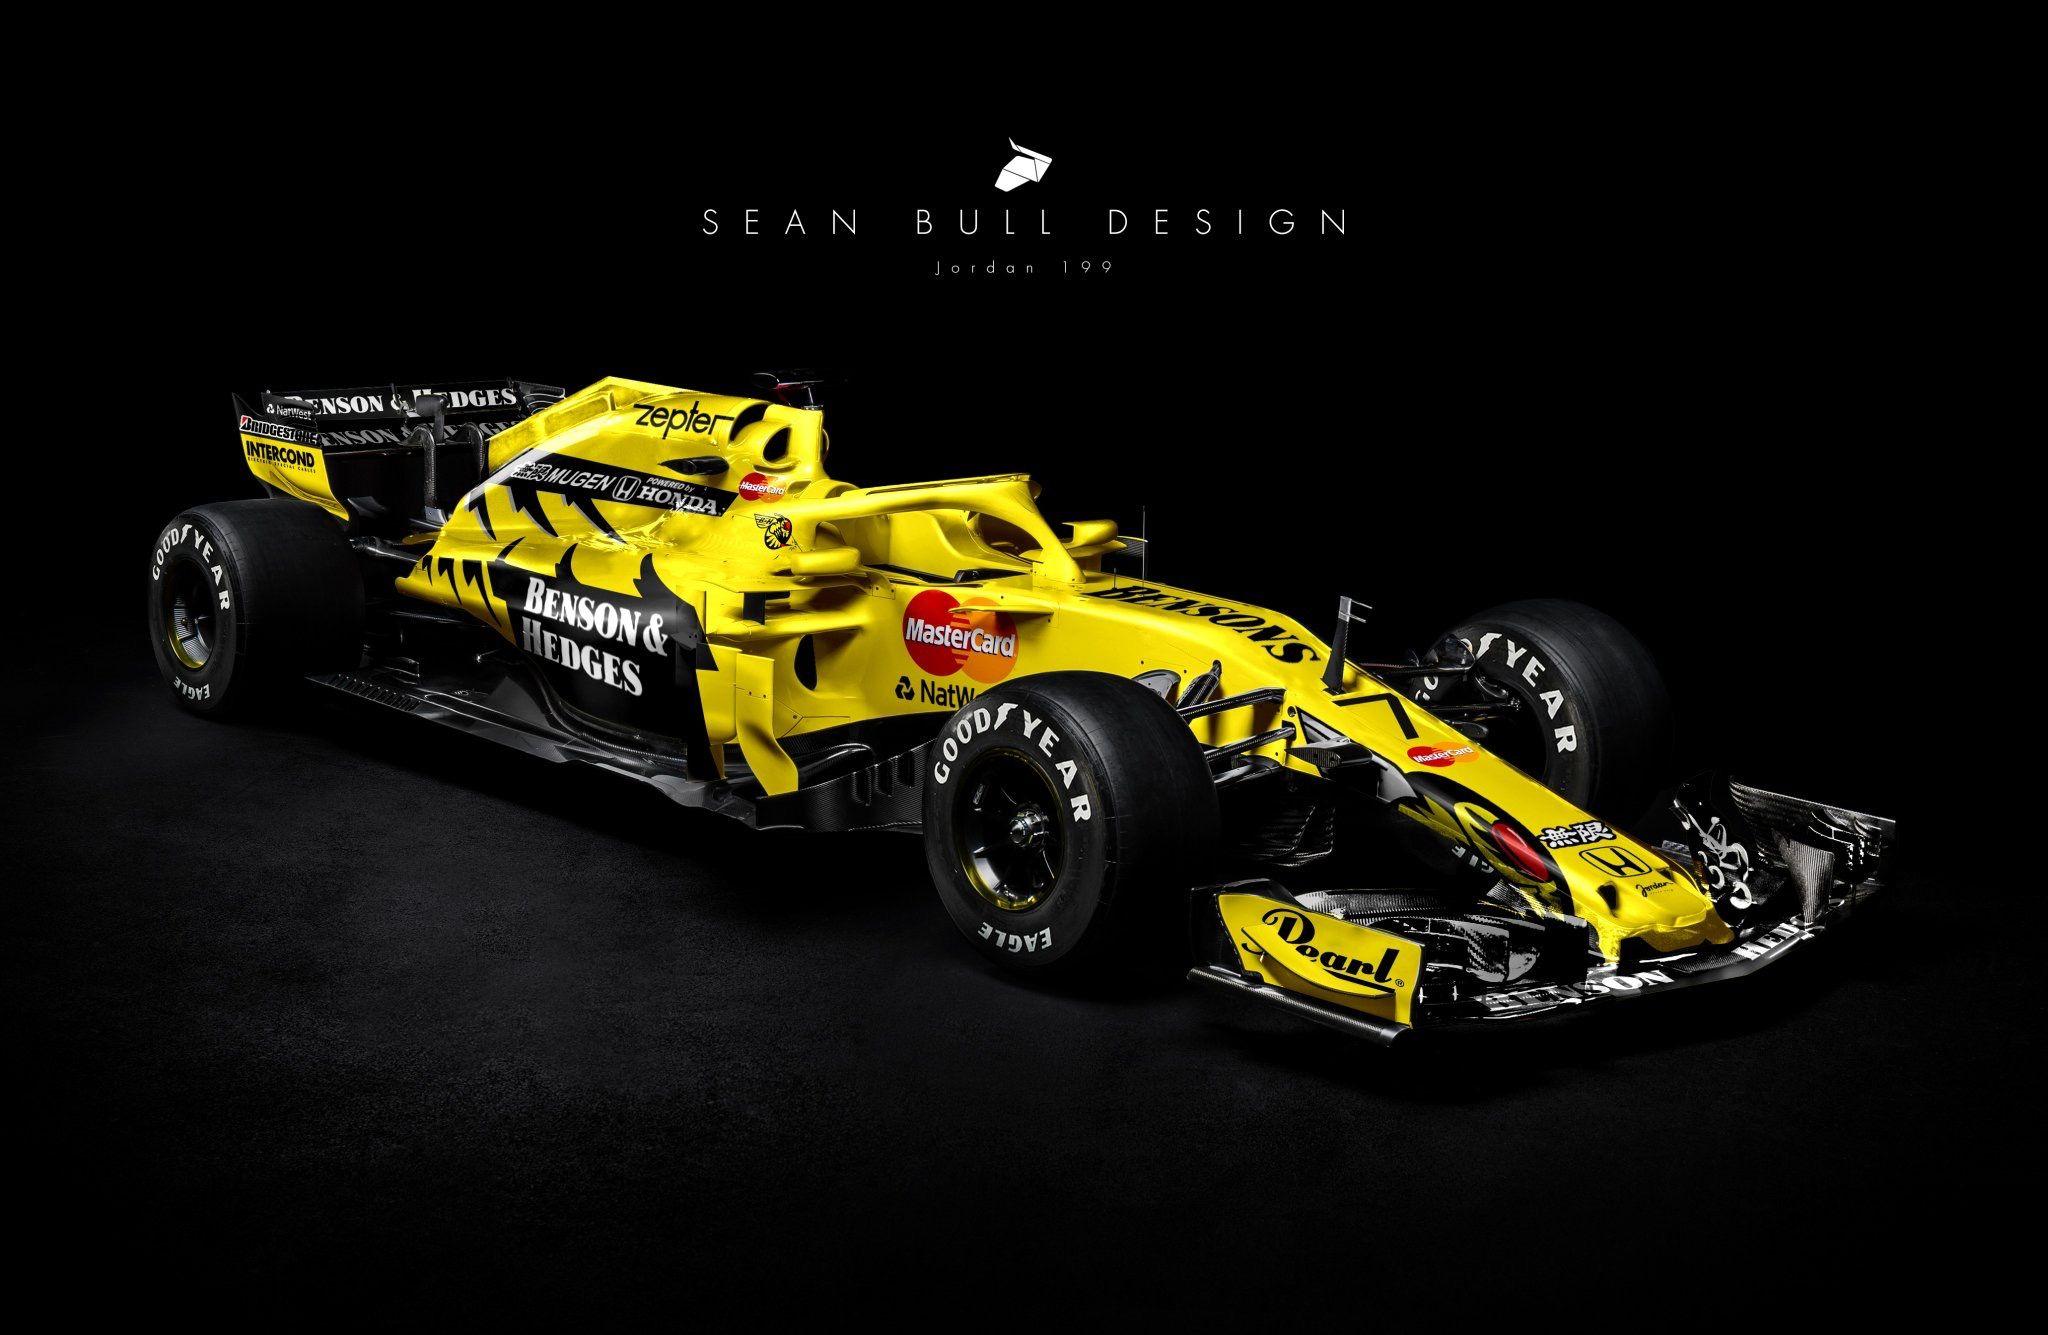 Jordan 199 Sean Bull Design Carreras De Autos Autos Deportivos Autos